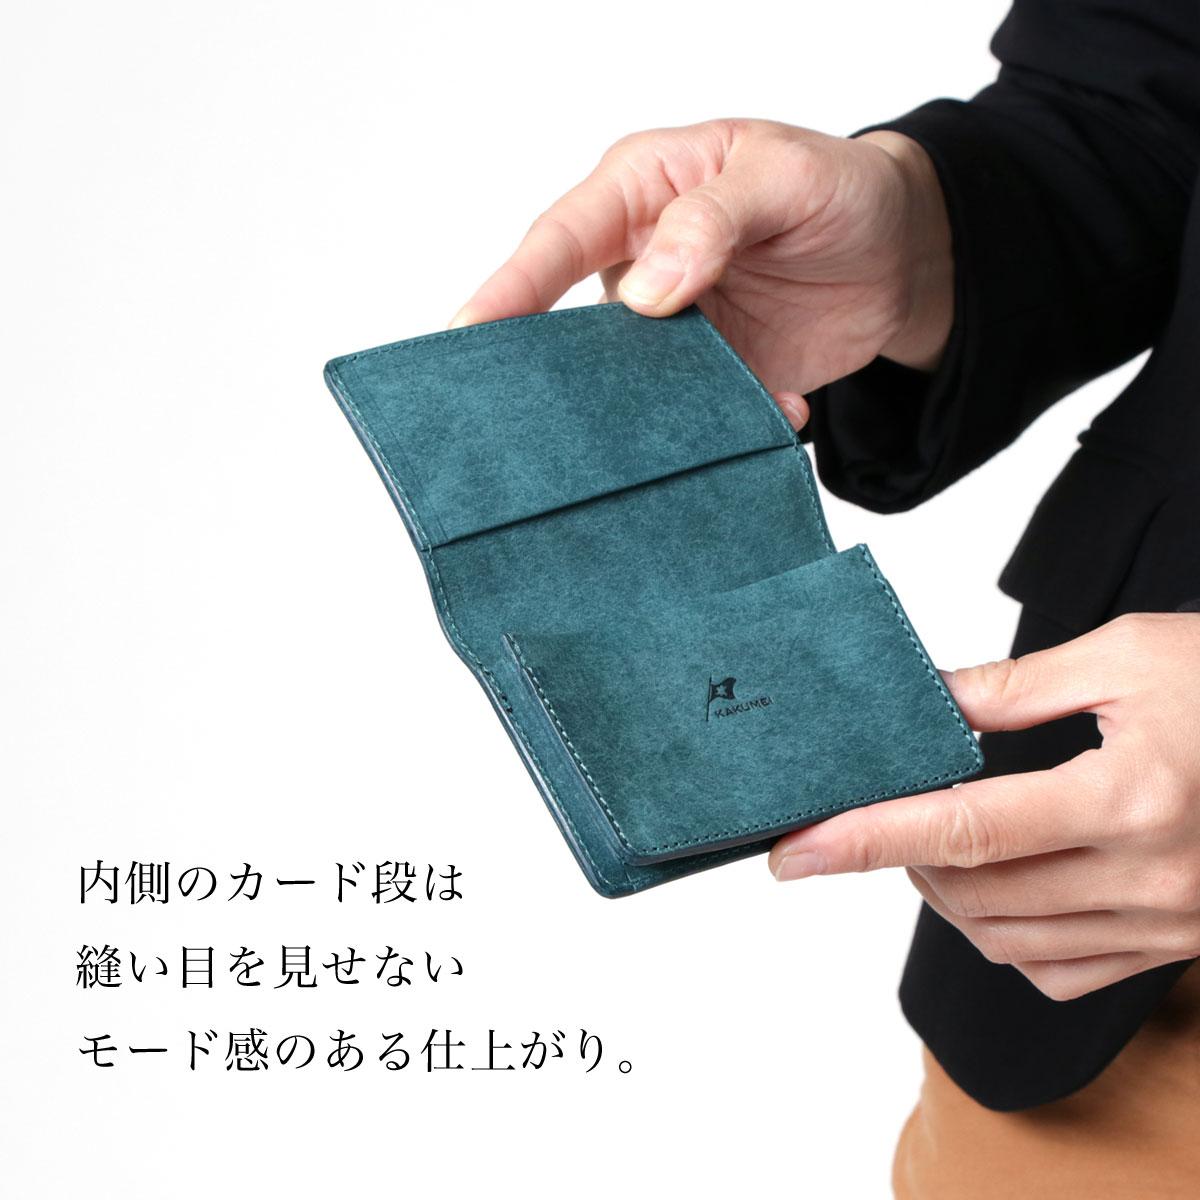 KAKUMEI カクメイ BOK型名刺入れ ボックス型 ネームカードケース 50枚収納 日本製 本革 プエブロ イタリアンレザー PUEBLO フルレザー 革命